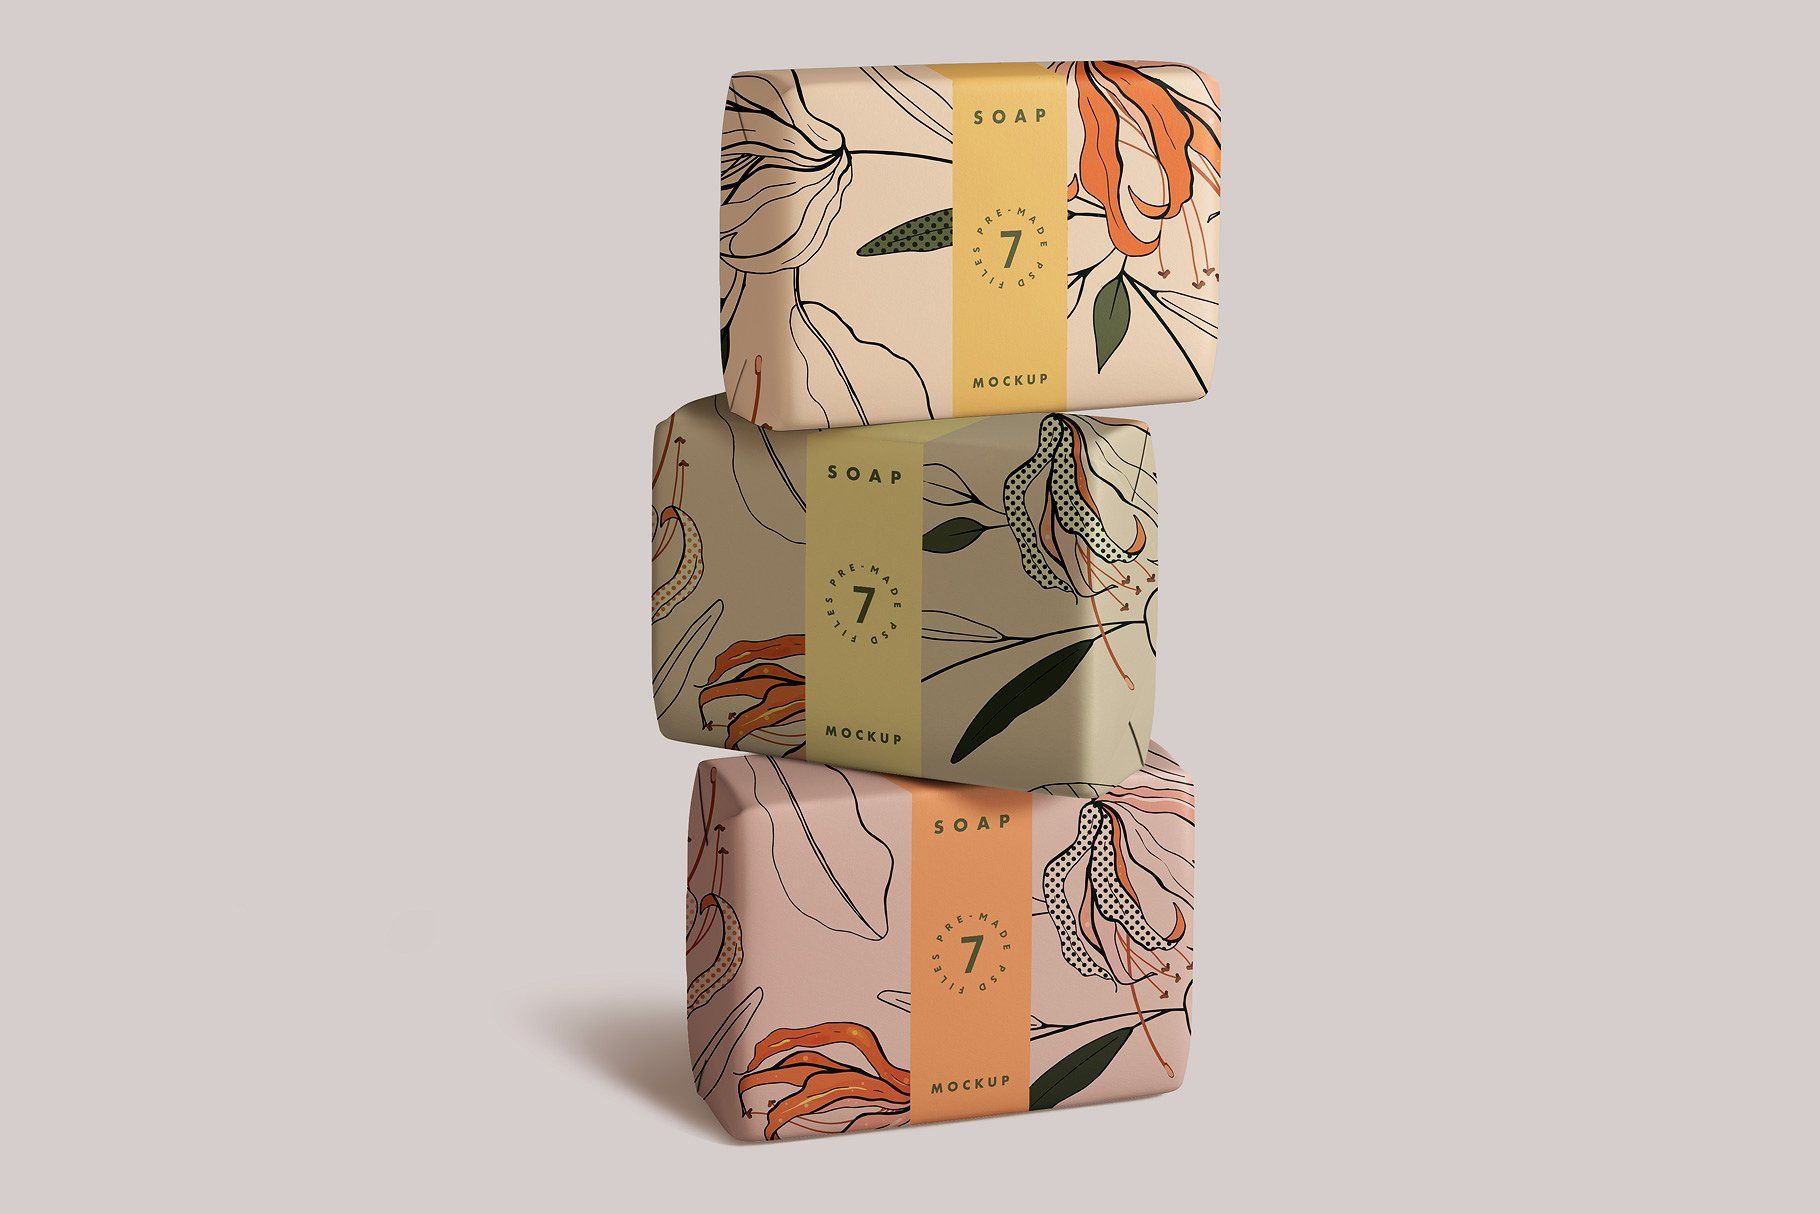 Soap Bar Mockup Soap Bar Soap Graphic Design Branding